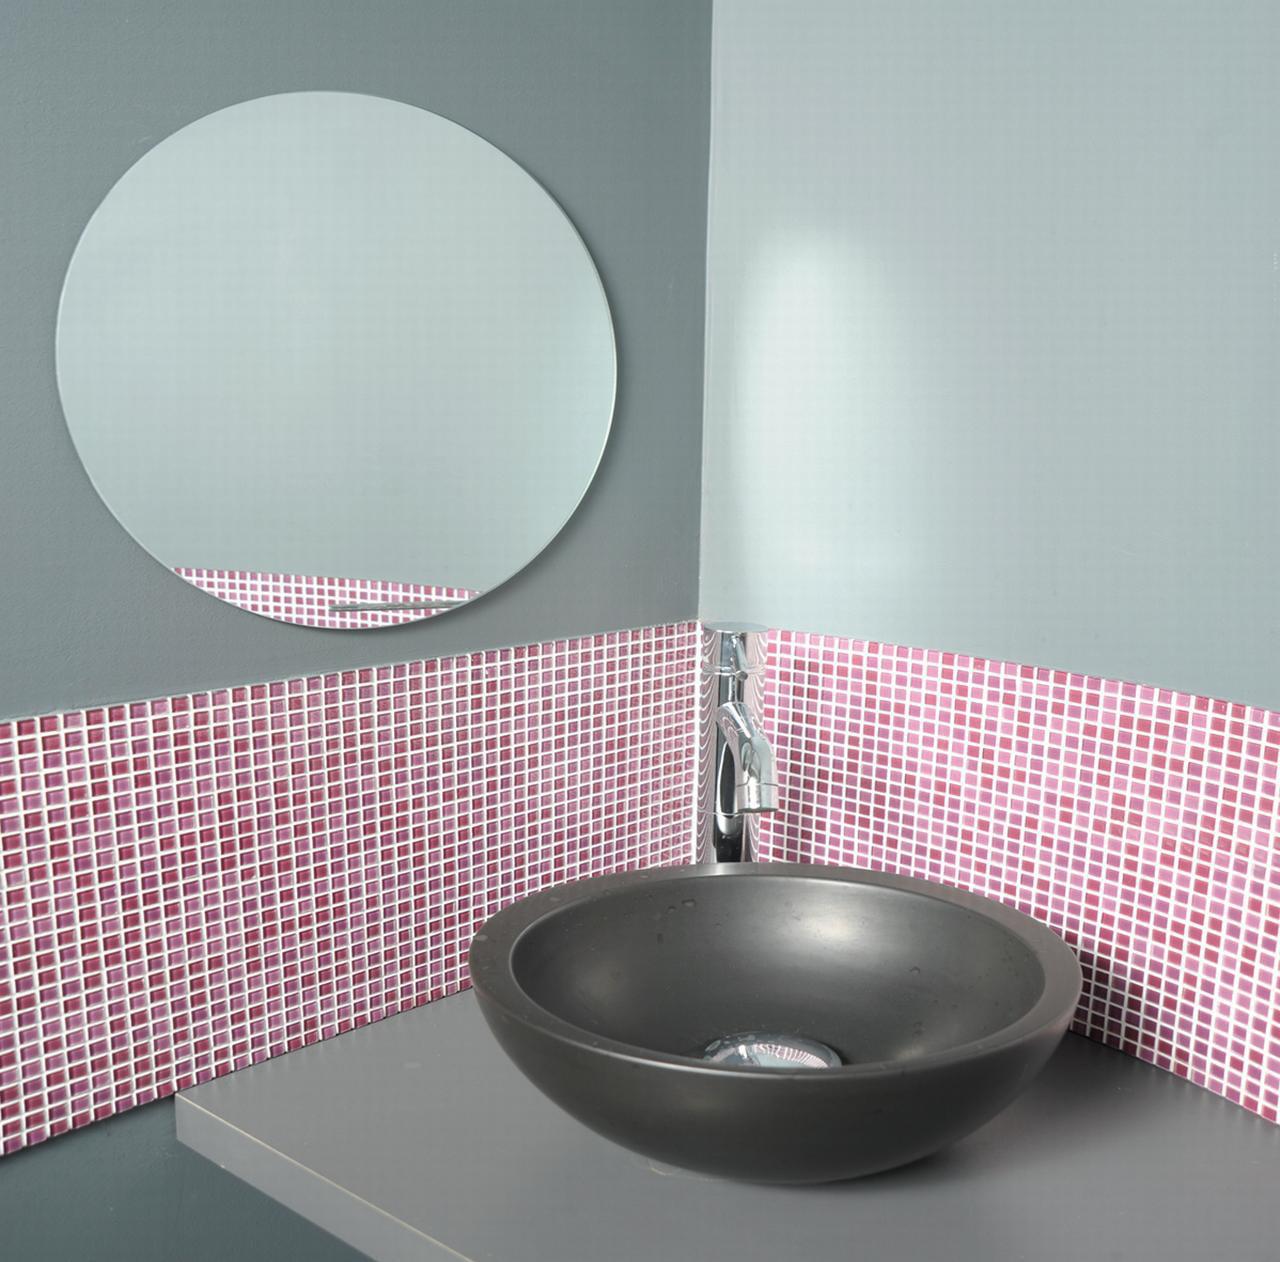 "Decorative Wall Bathroom Self Adhesive Round Mirror Diameter 15.7"" by Evideco"